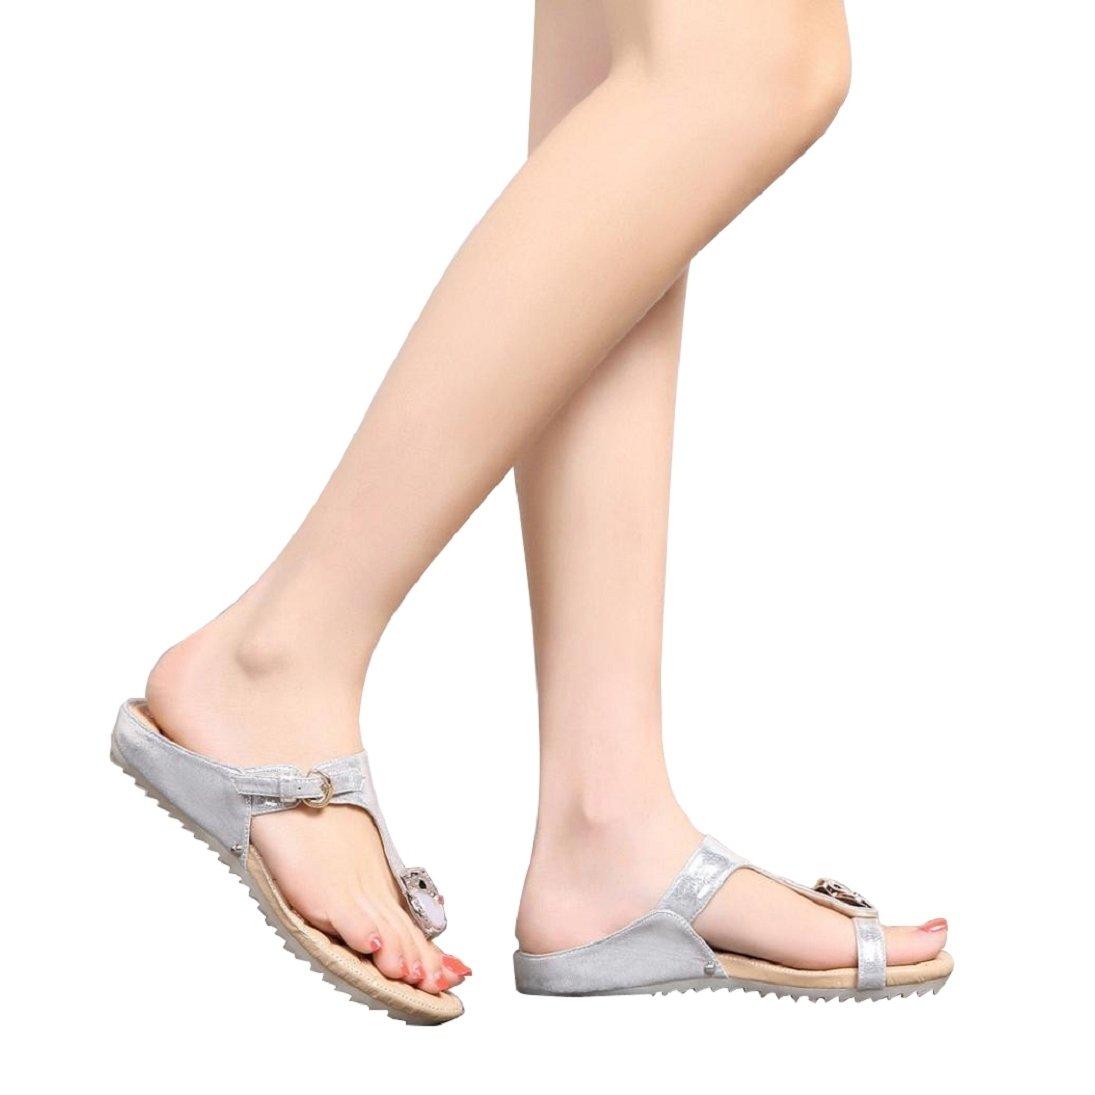 Fheaven Women Sweet Rhinestone Flat Heel Anti Slip Beach Shoes Sandals Slipper (US:5, Silver)